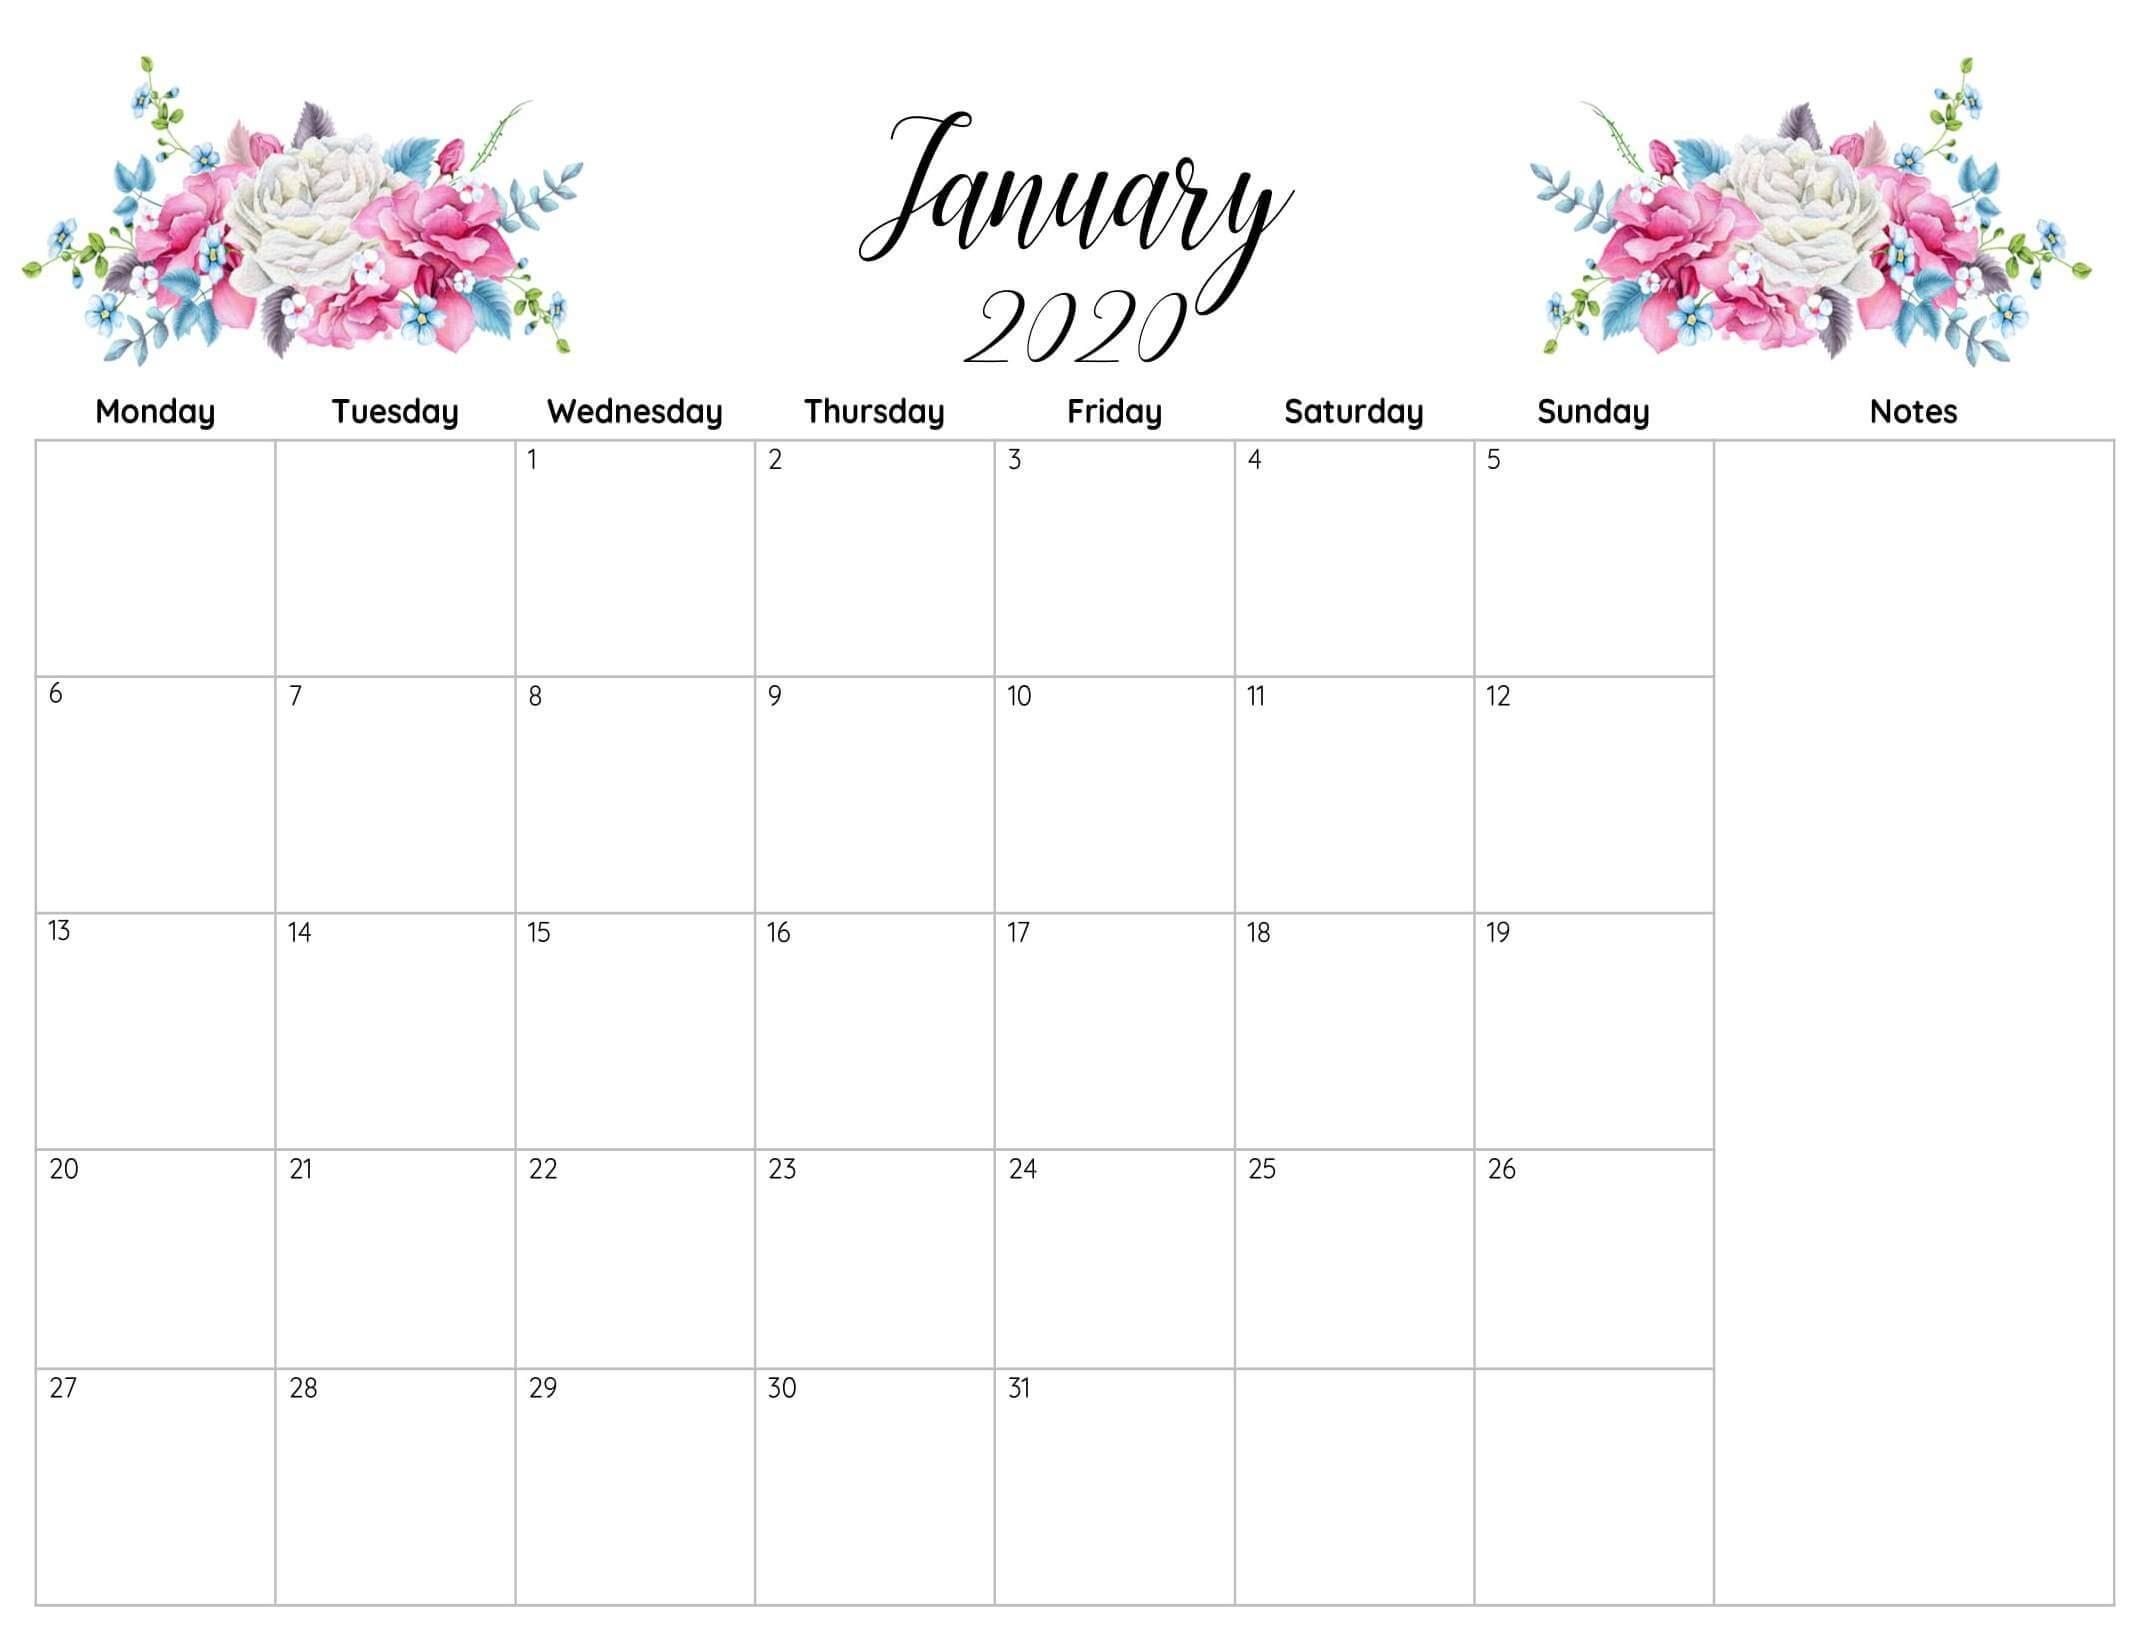 Calendar 2020 January Printable Template - 2019 Calendars